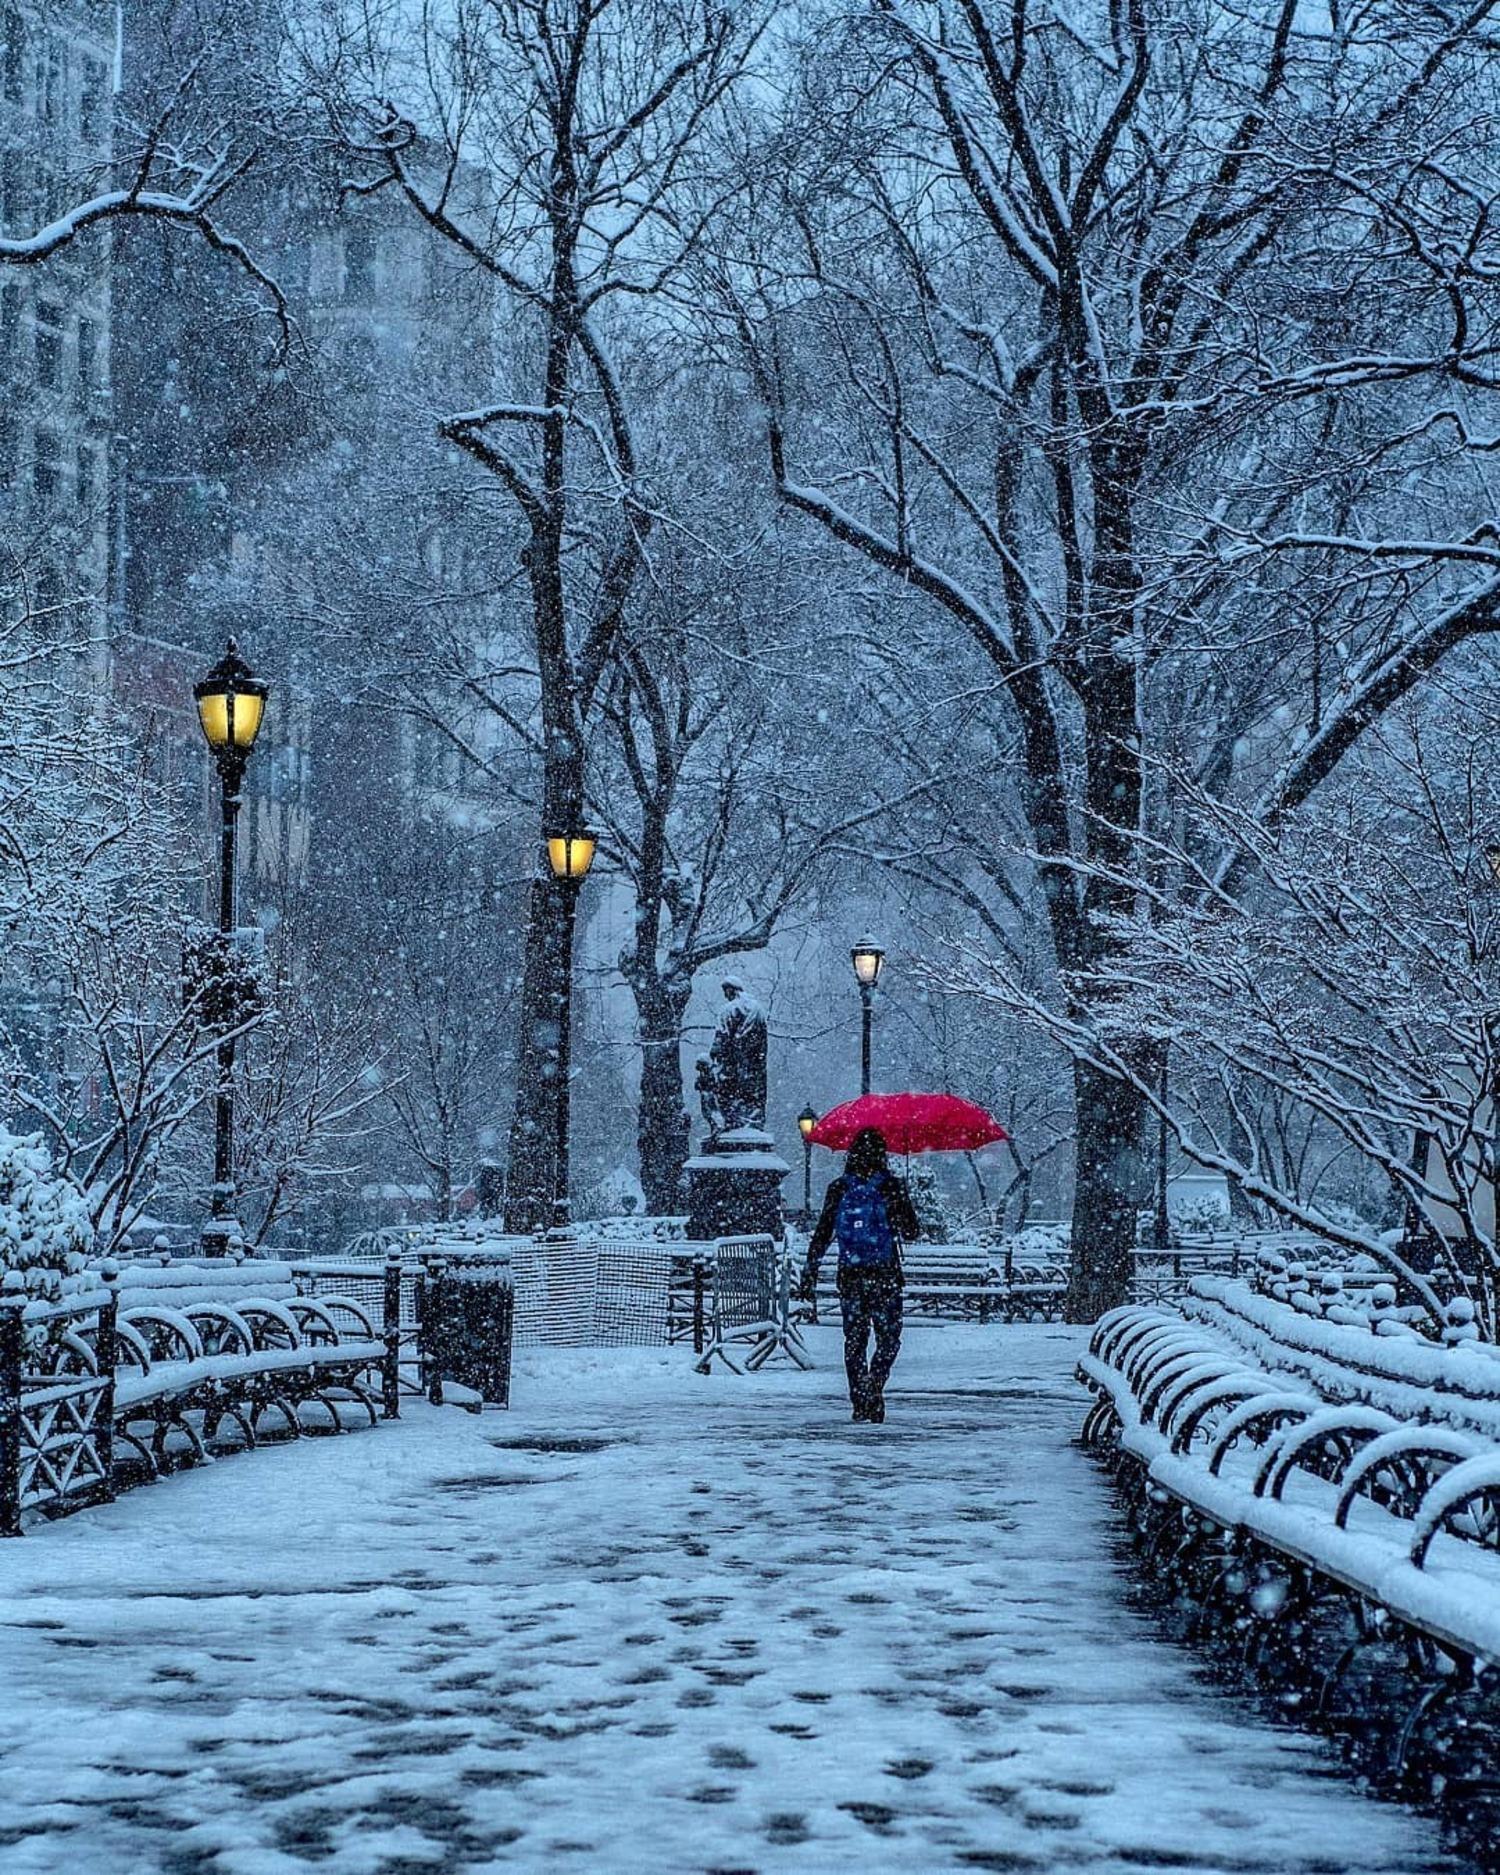 Union Square Park, New York, New York